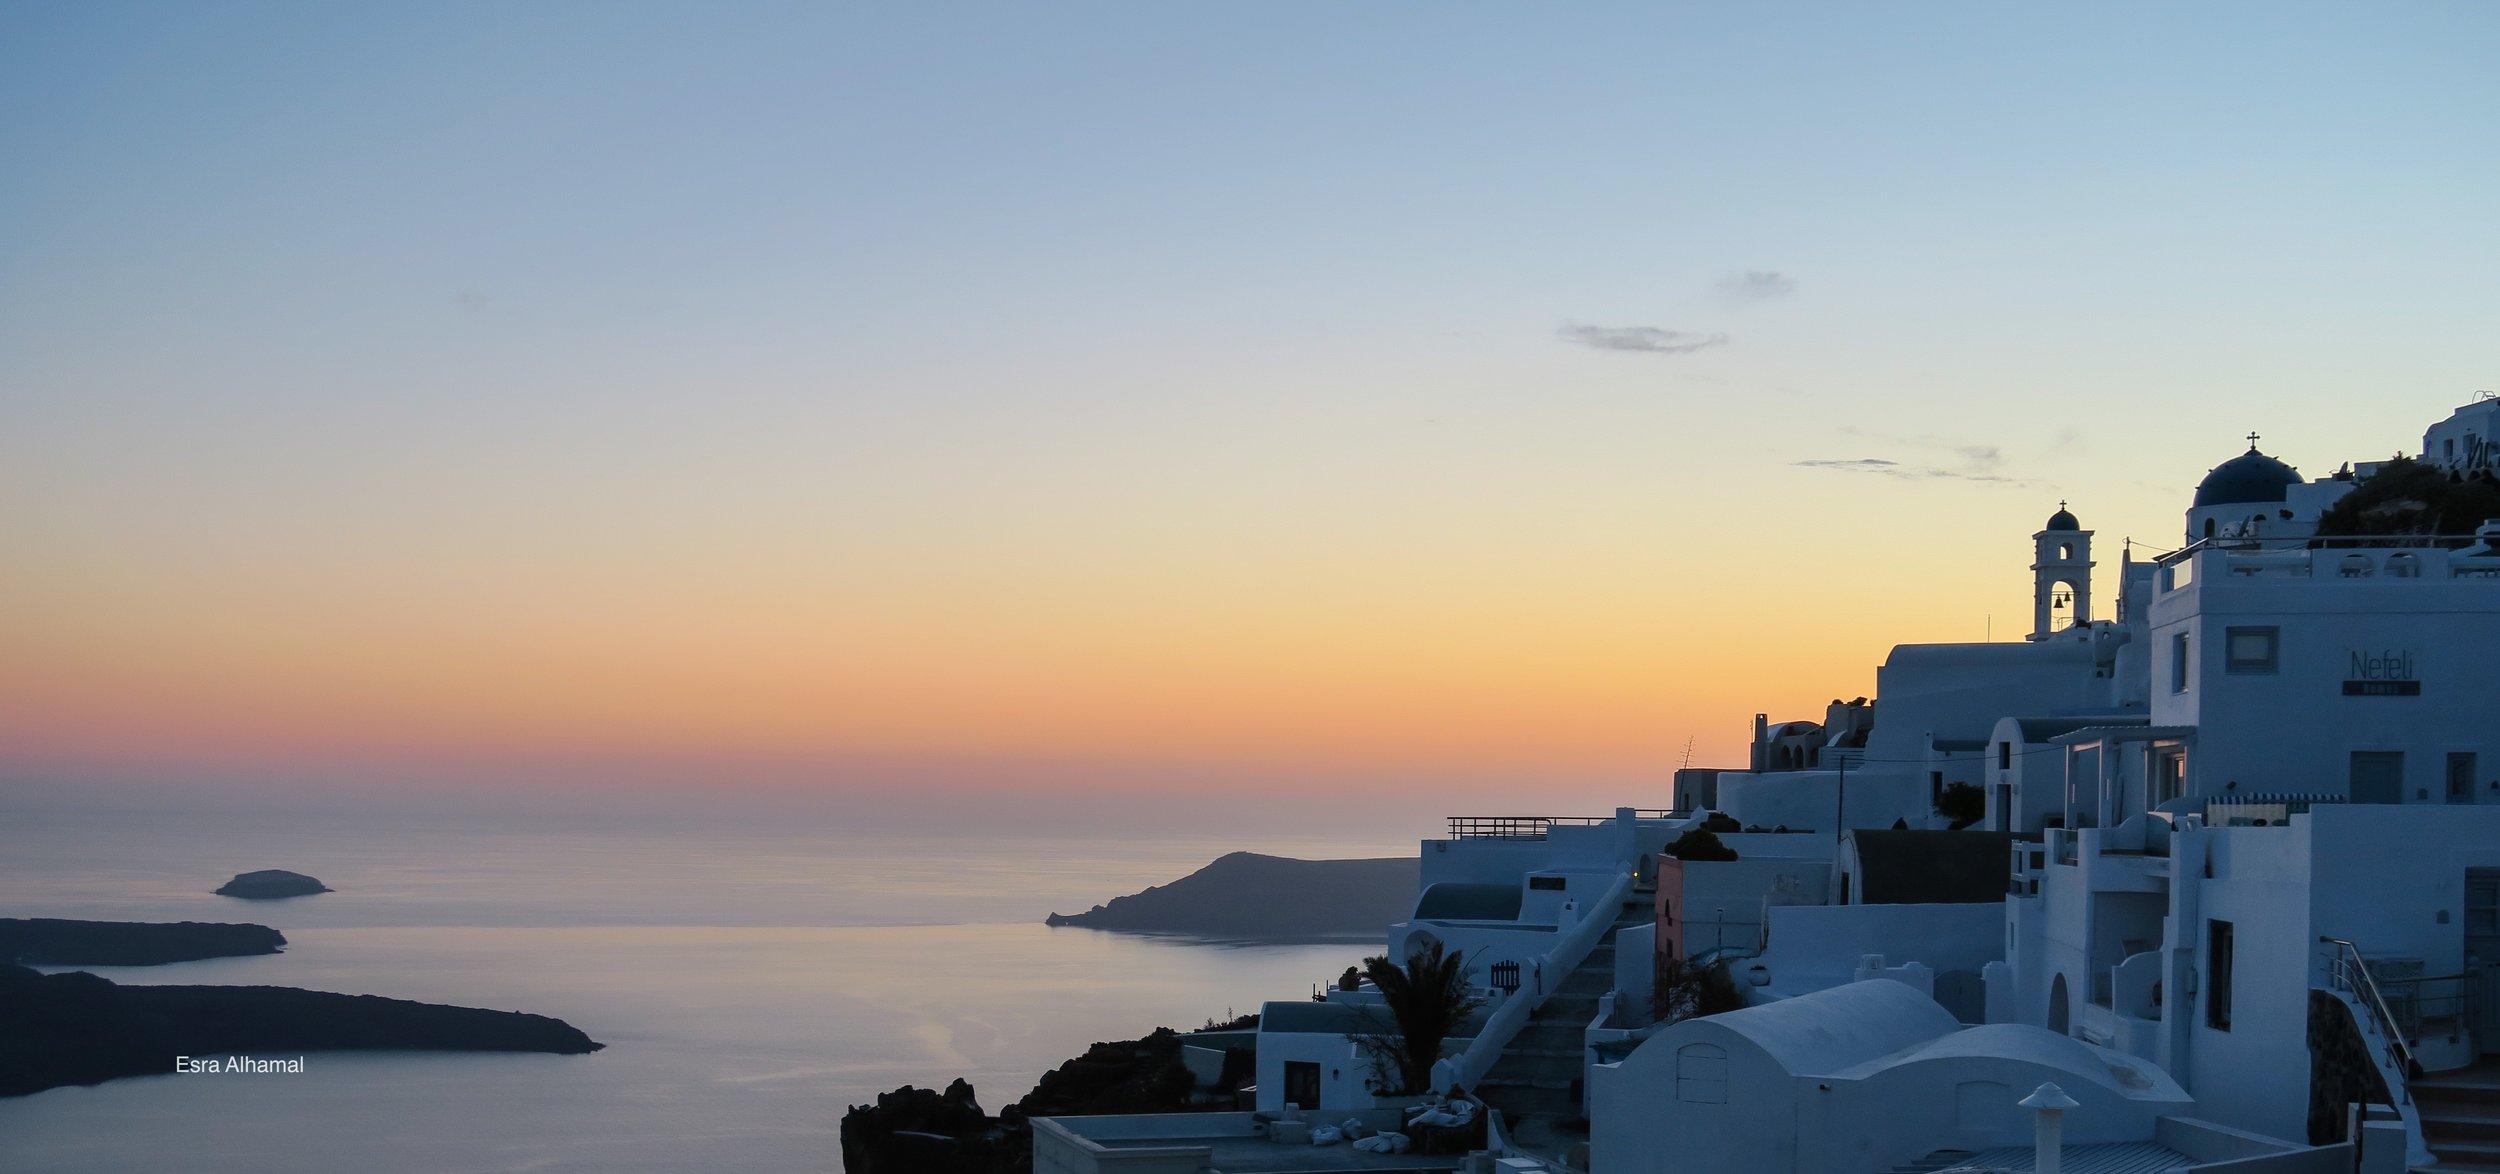 The Sunset in Santorini